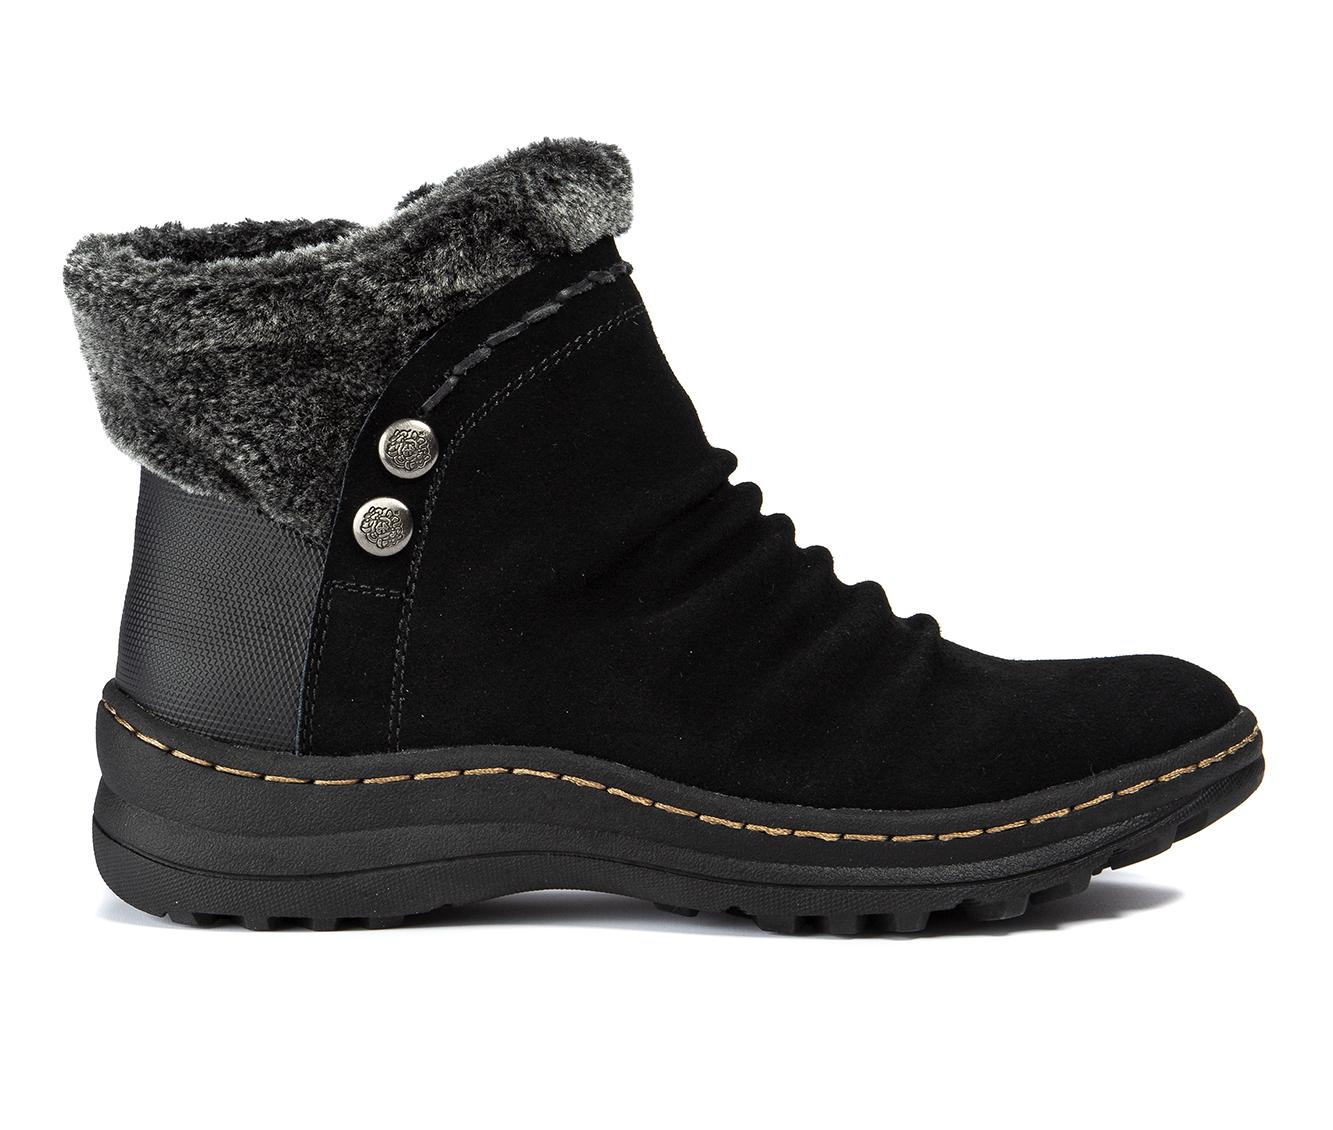 Baretraps Alick Women's Boot (Black Leather)